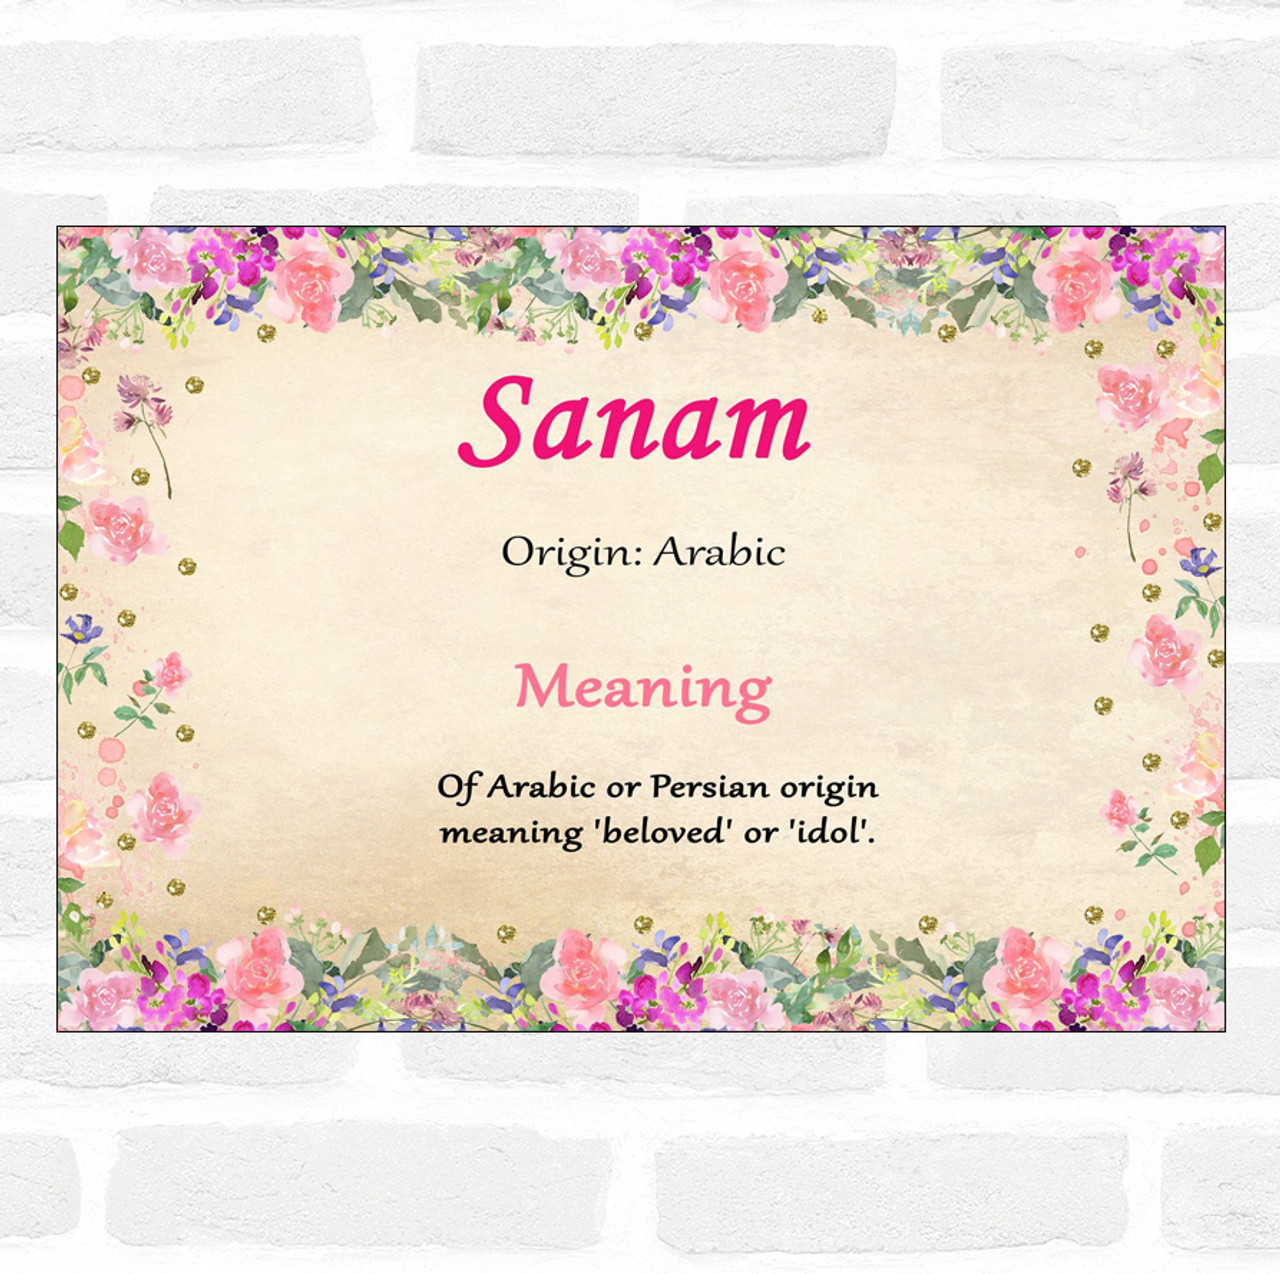 Sanam name photo